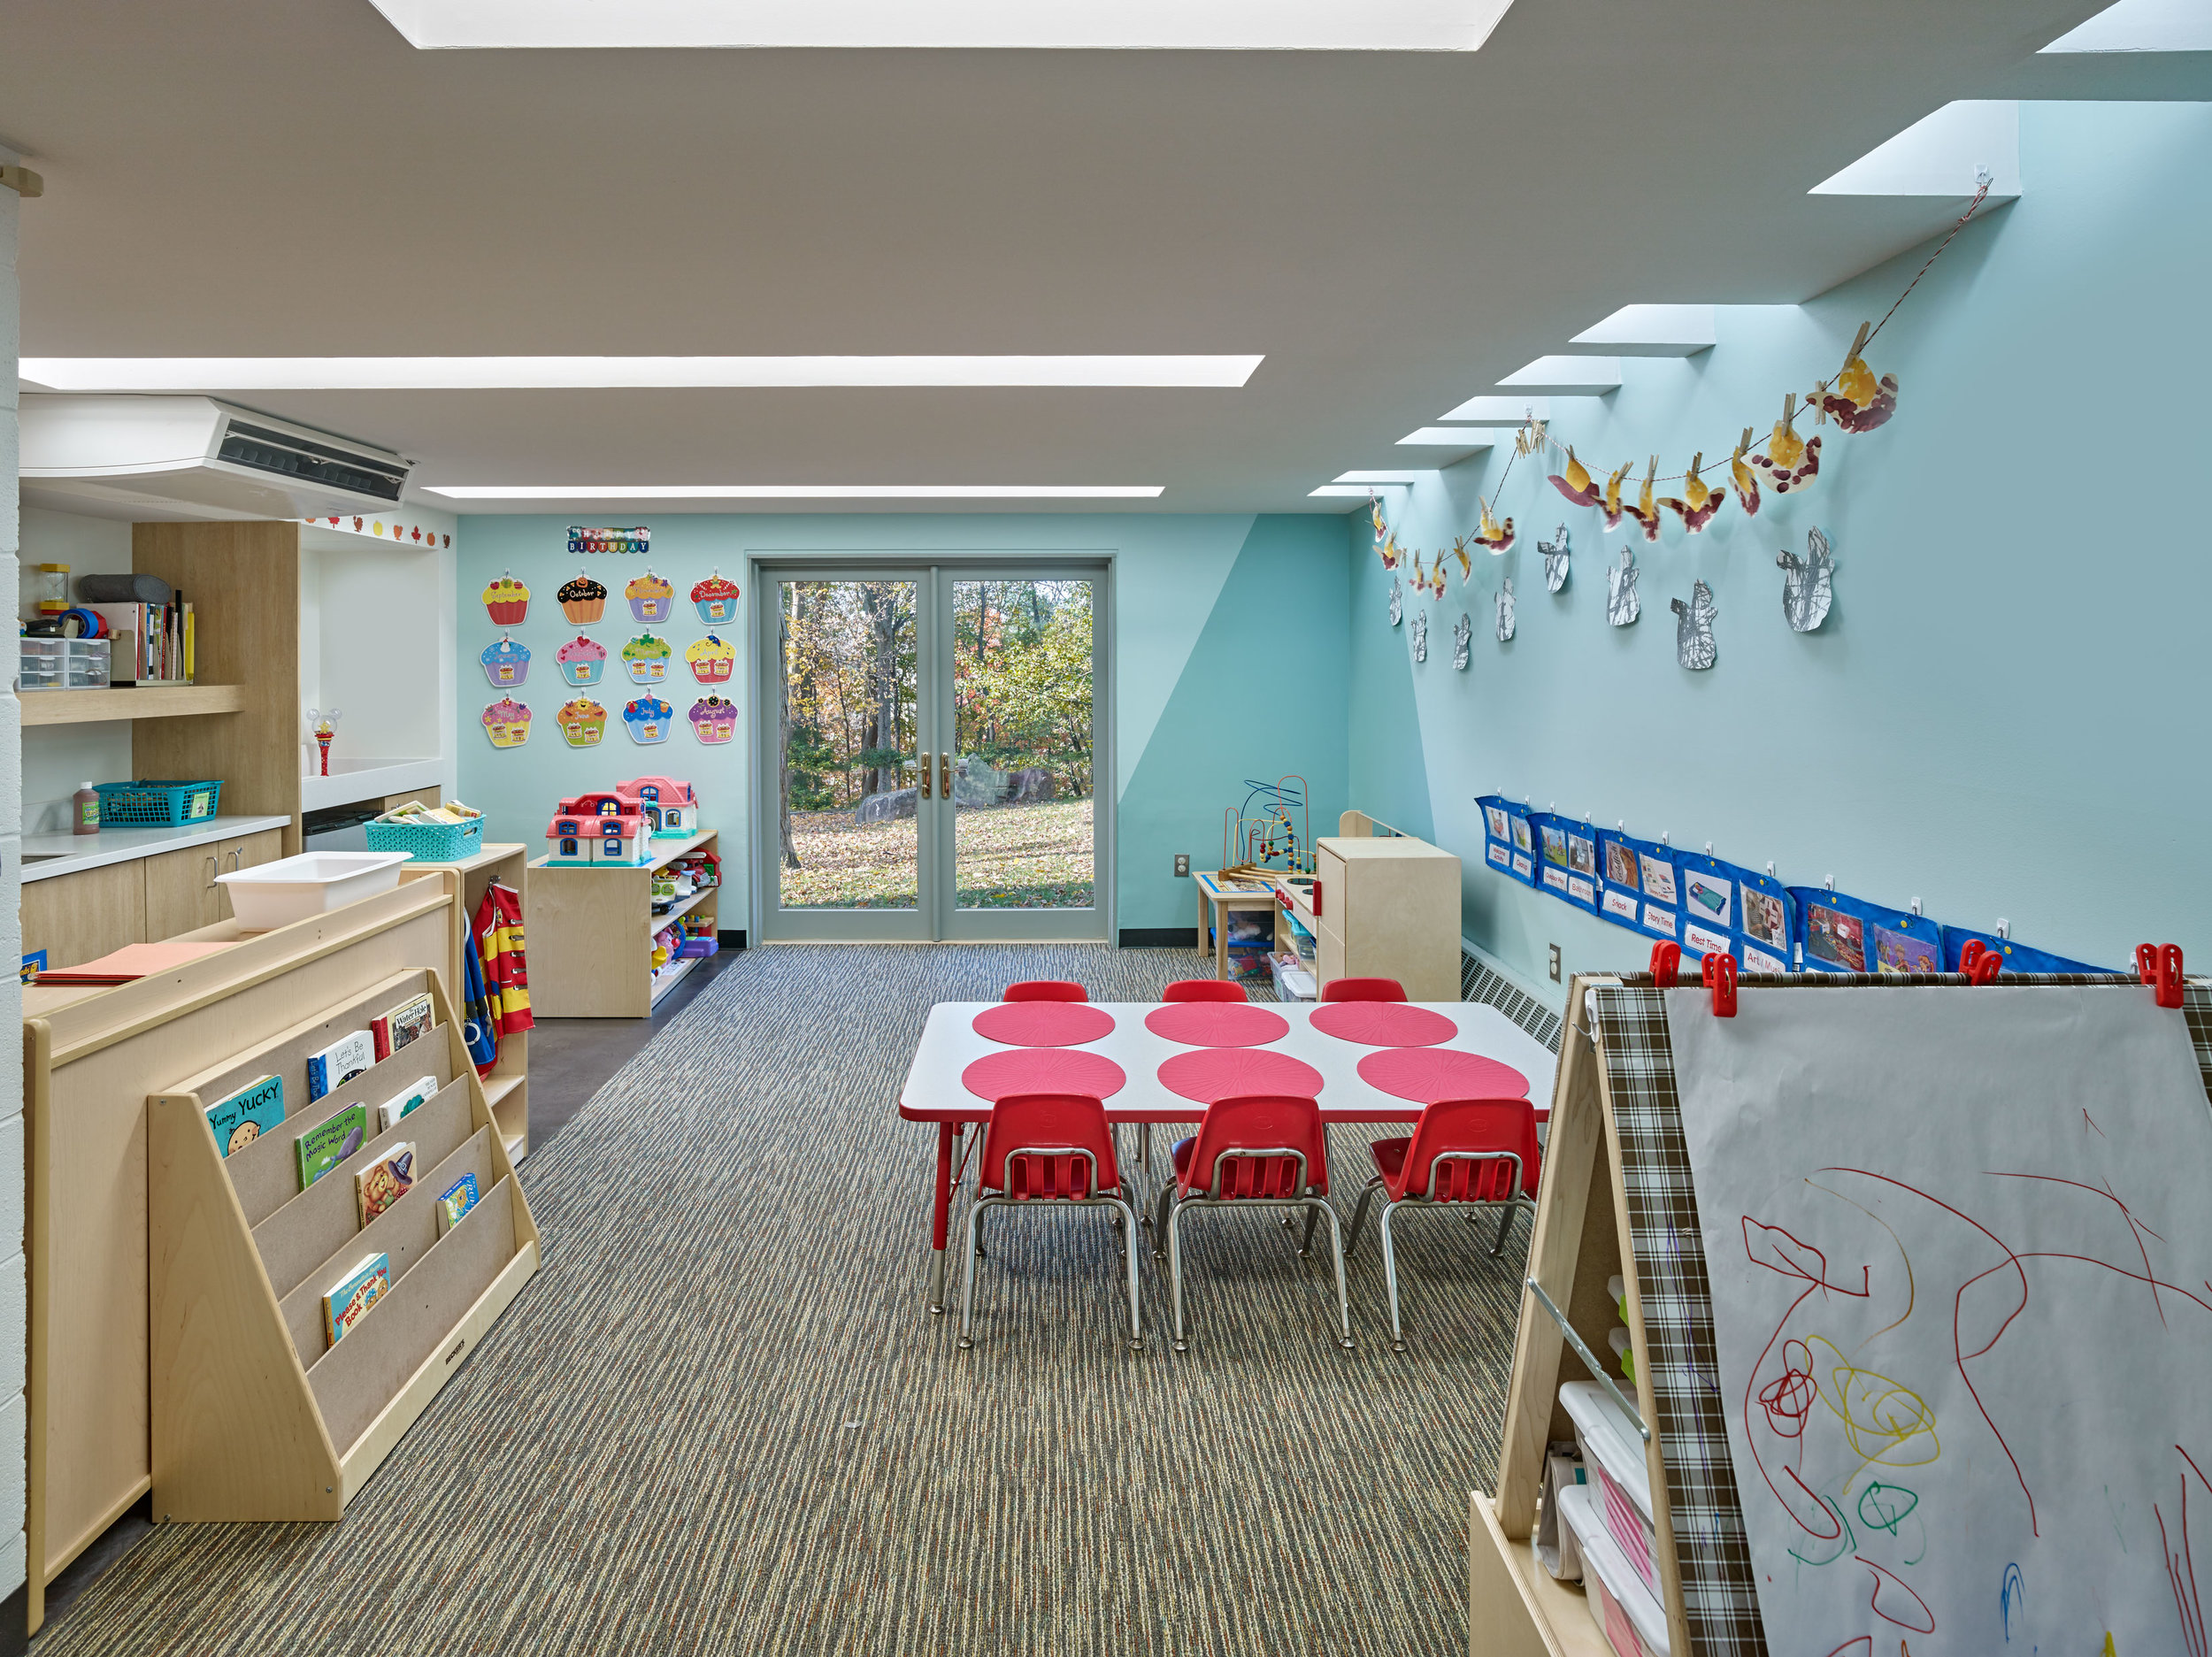 SAINT DAVID'S NURSERY SCHOOL